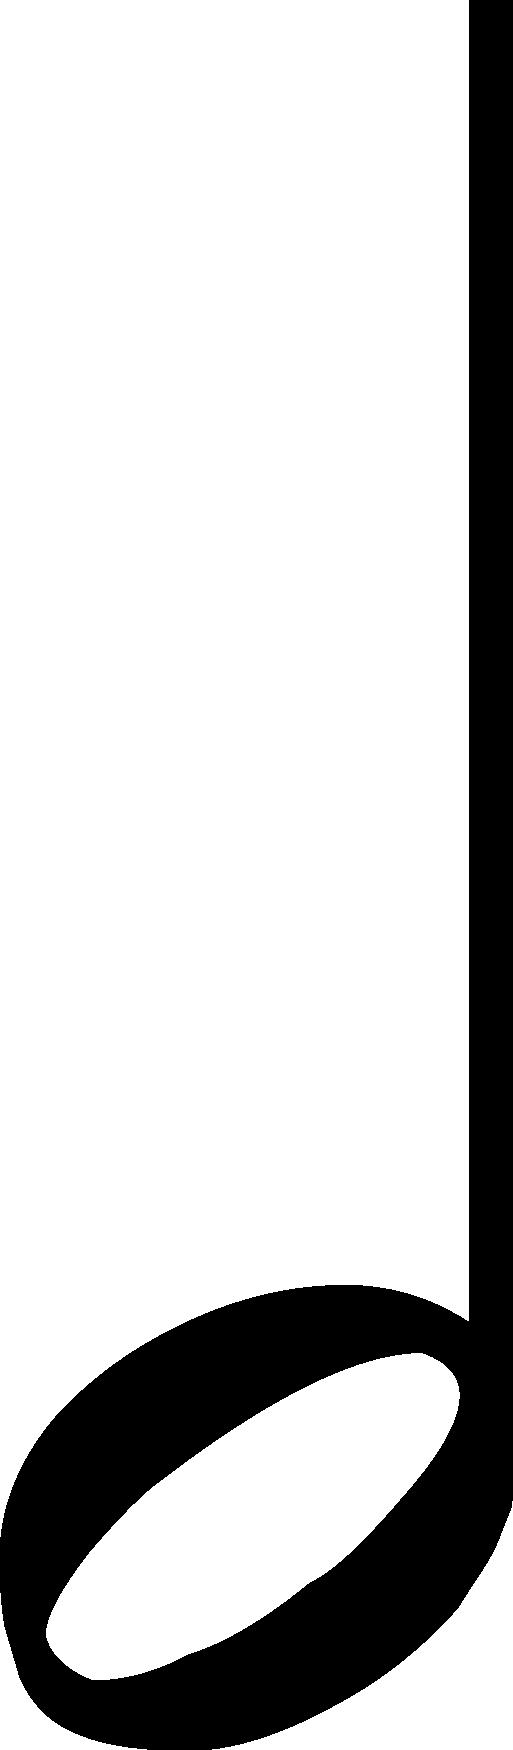 Quia basic music symbols half note biocorpaavc Gallery